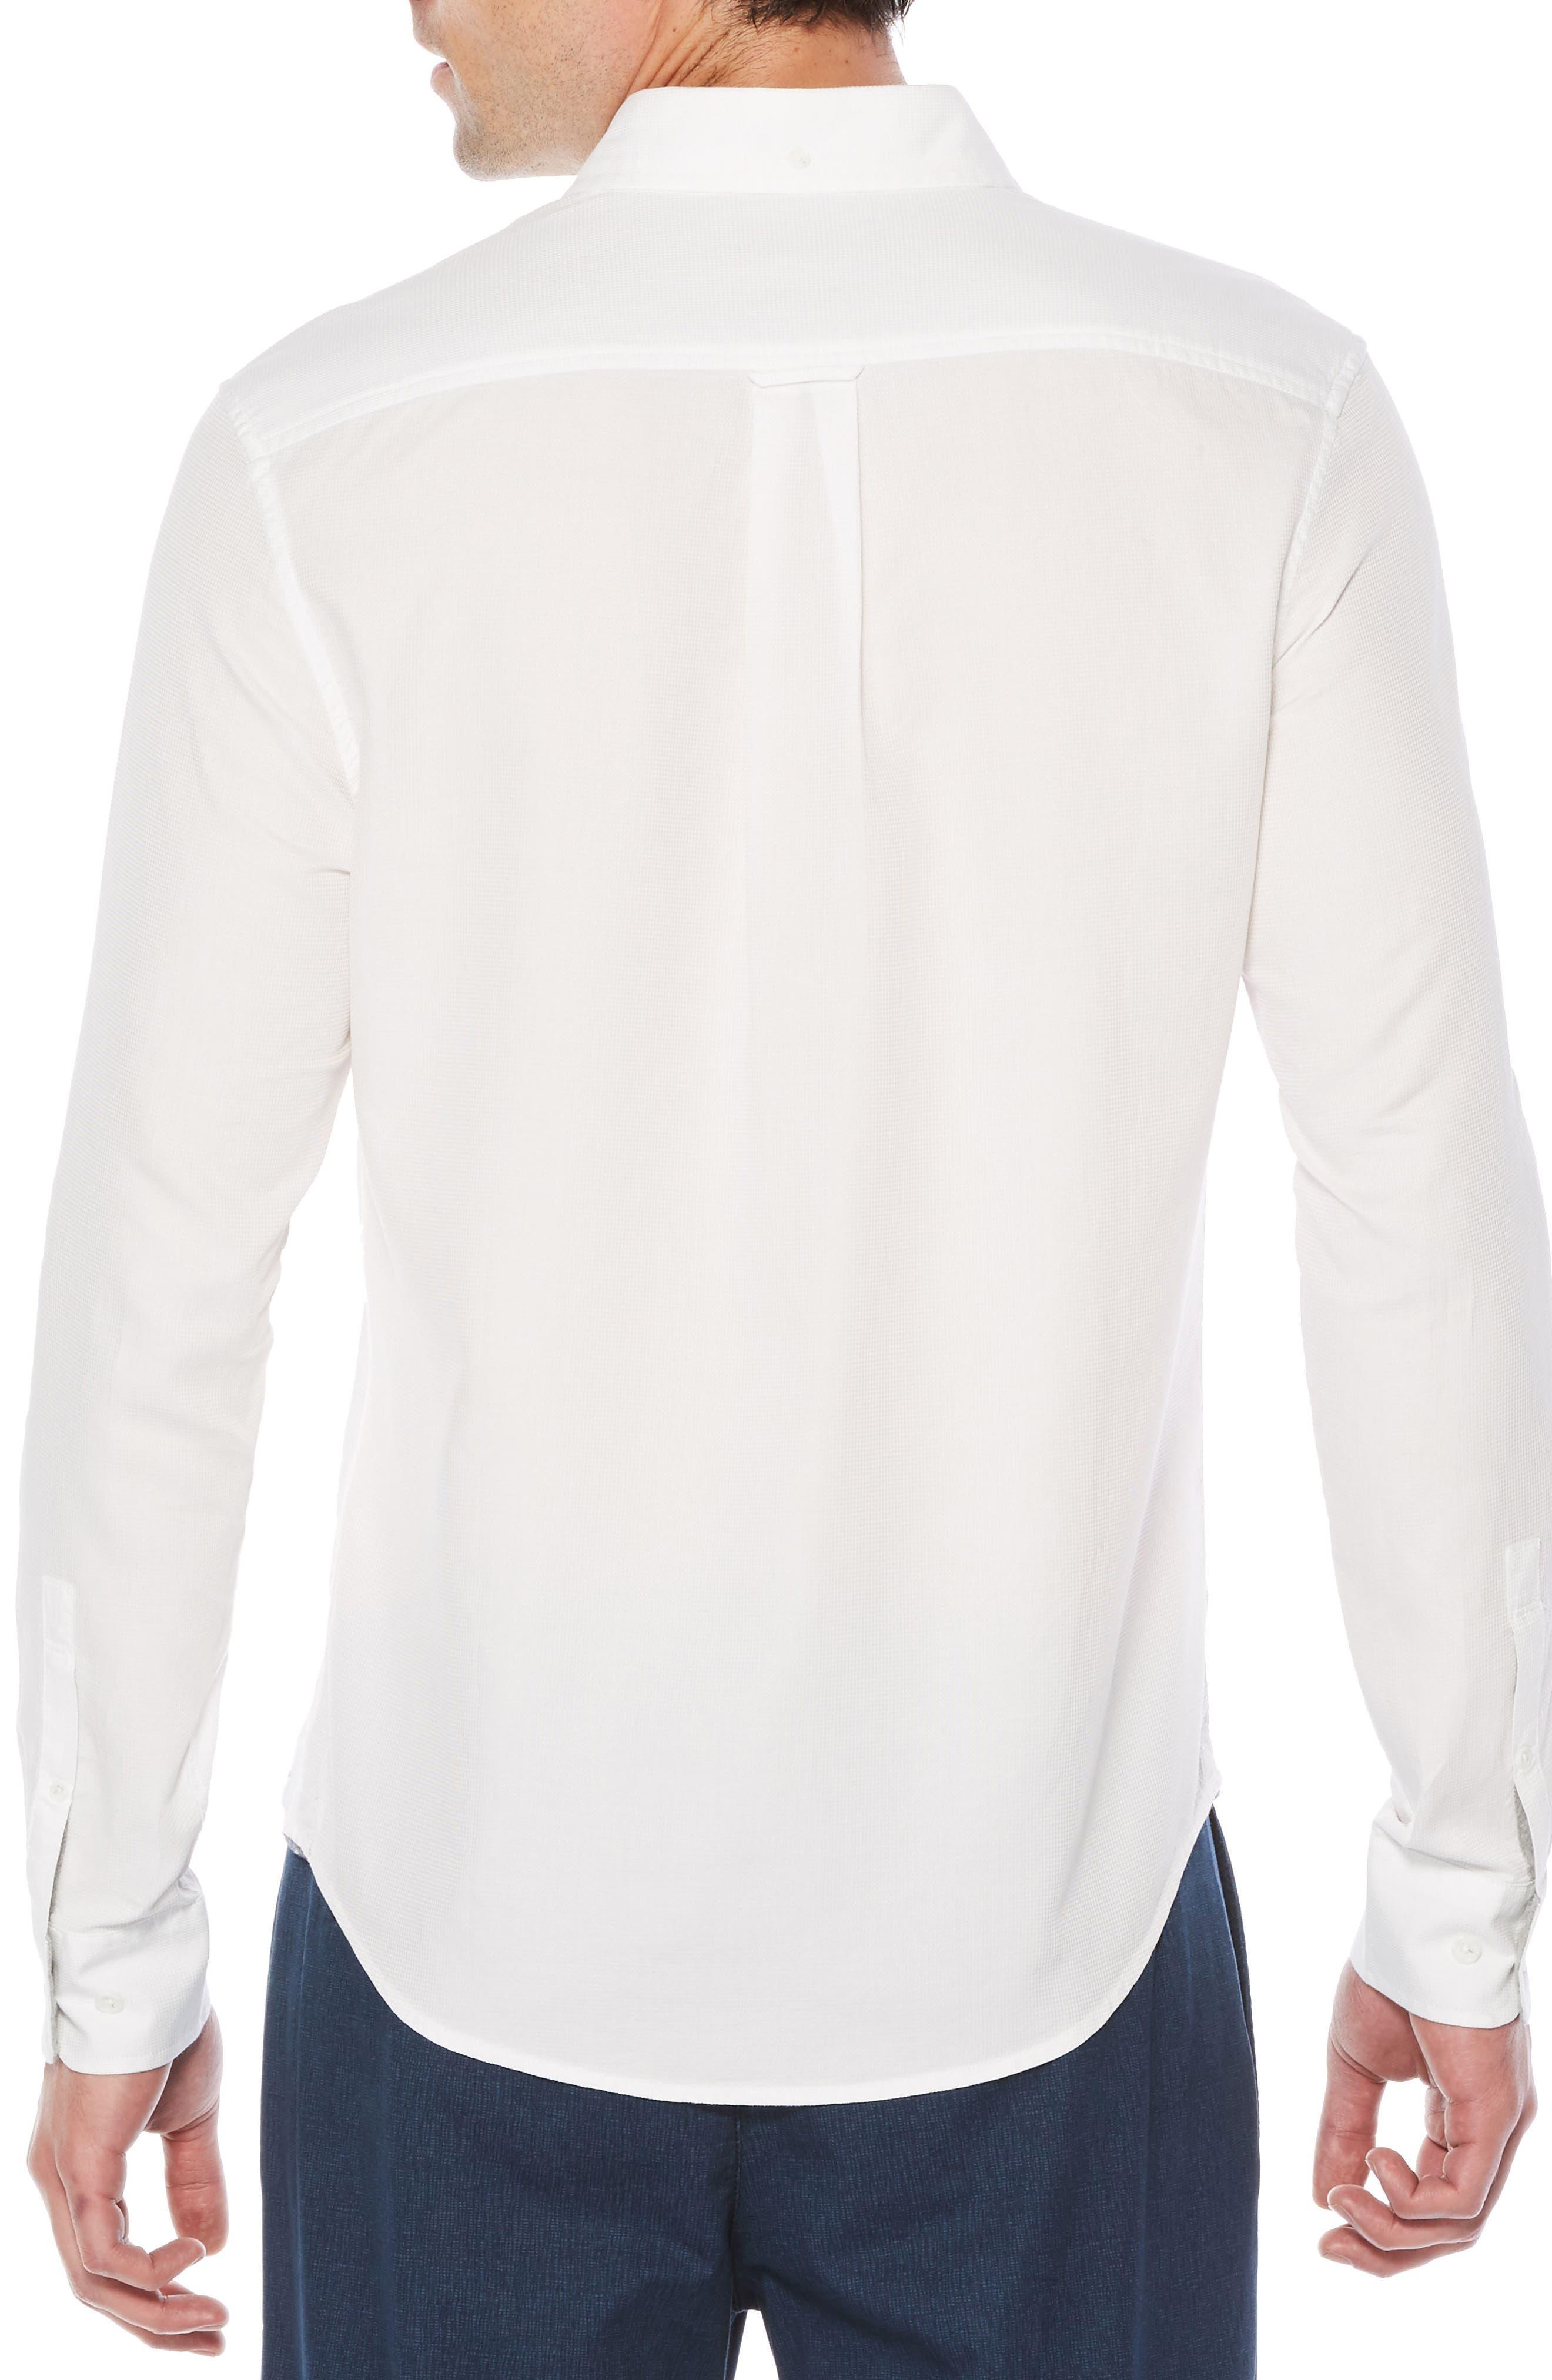 Woven Shirt,                             Alternate thumbnail 4, color,